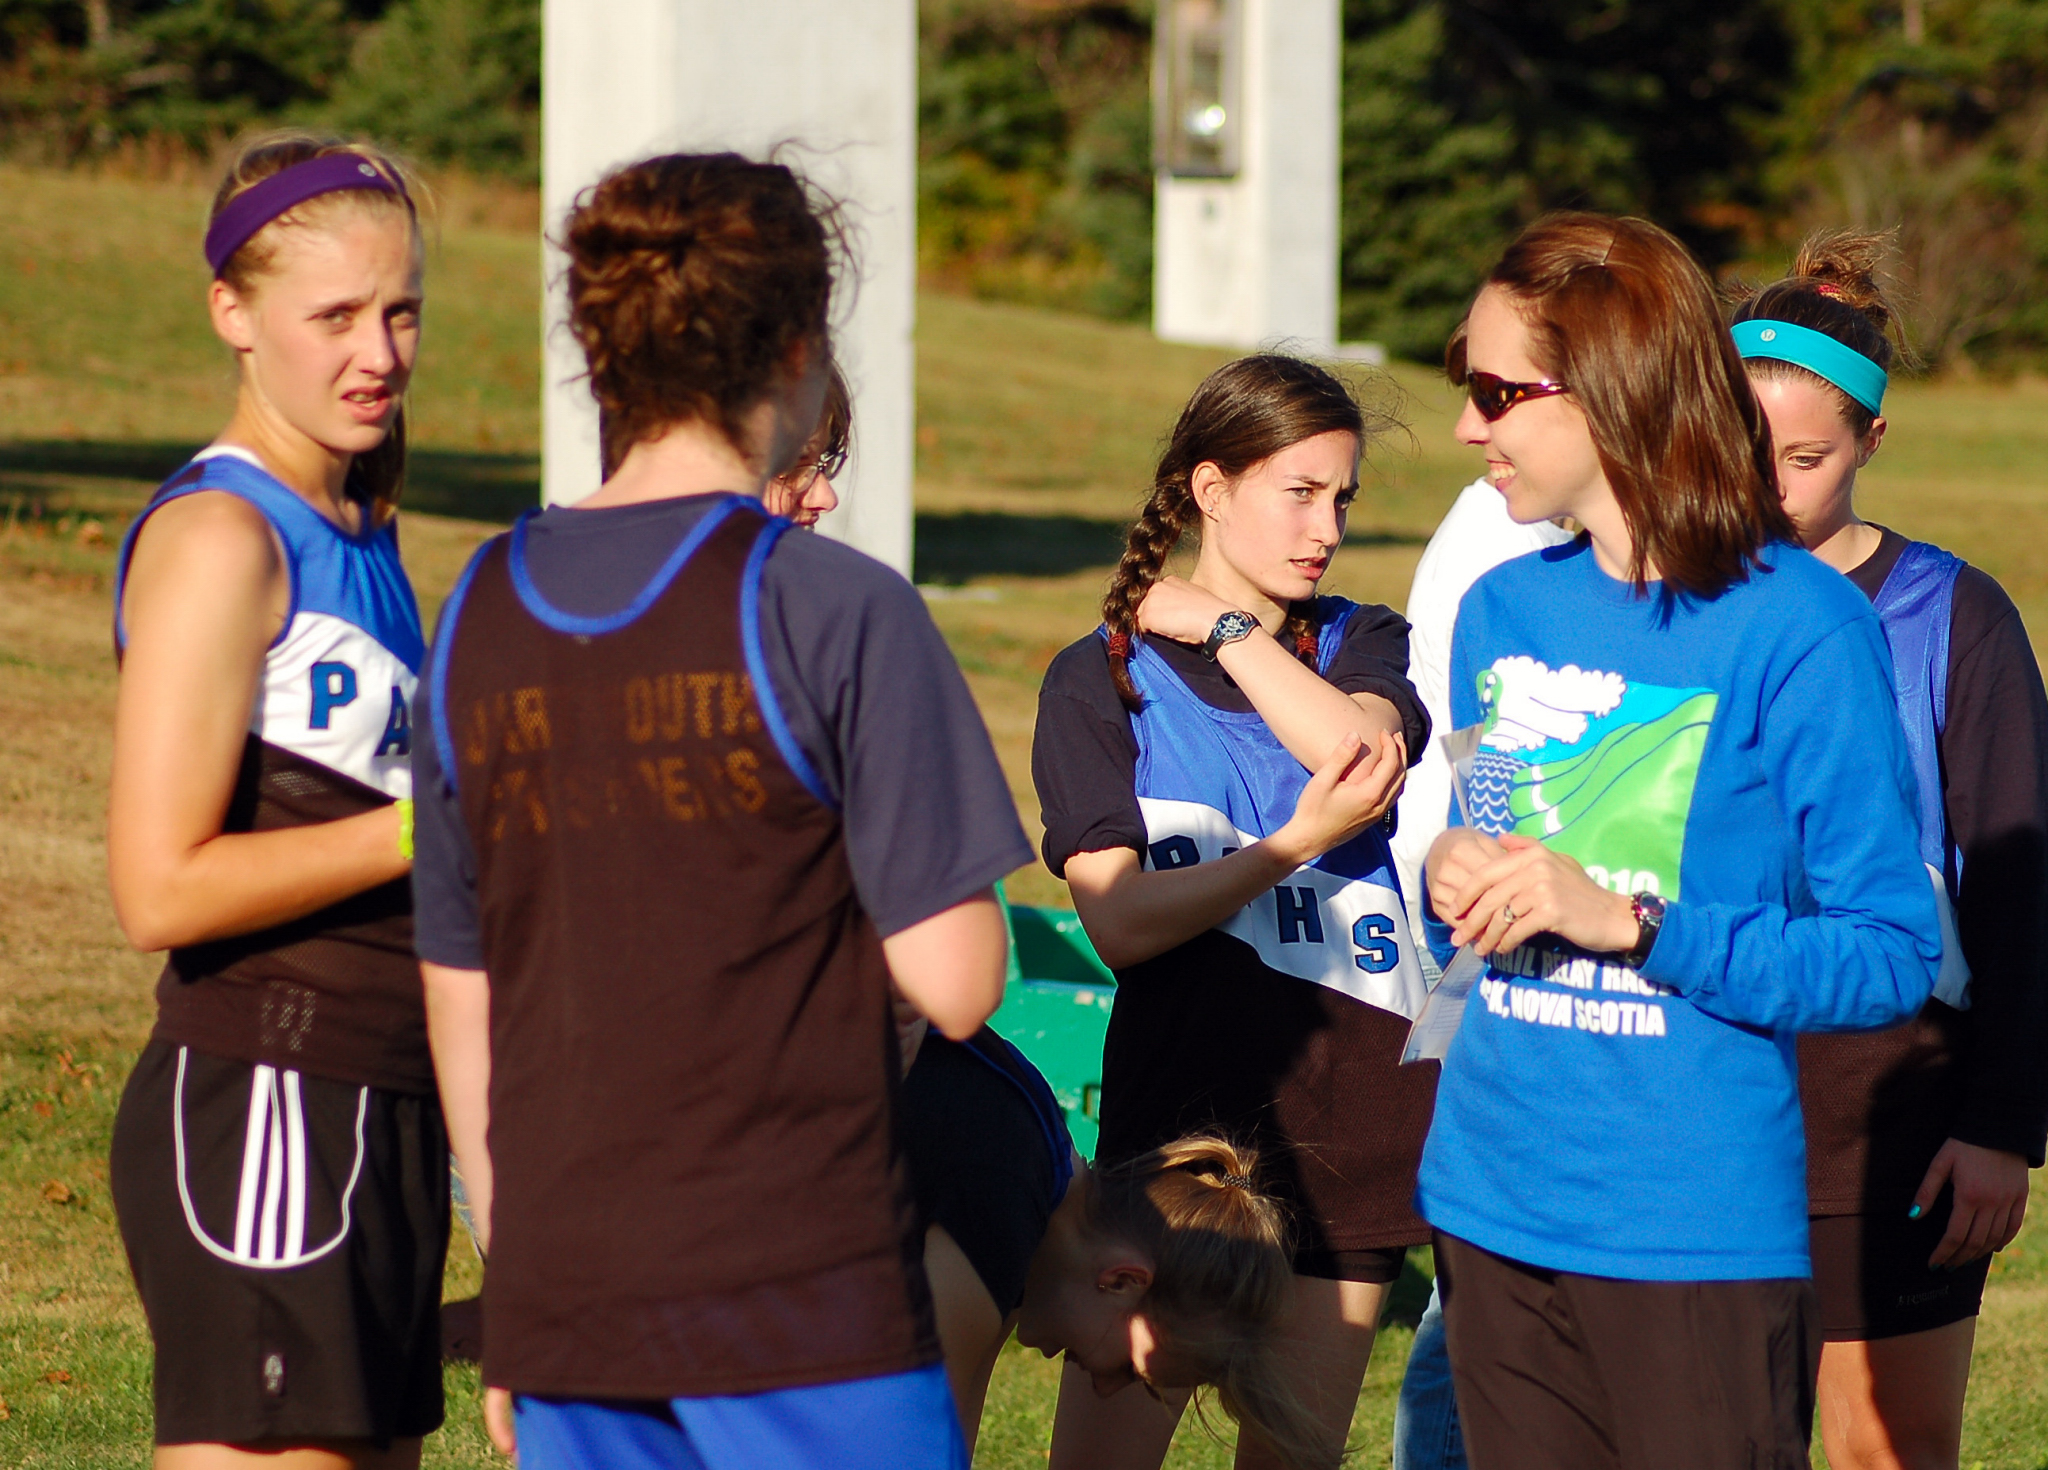 Coach country cross essay high running school